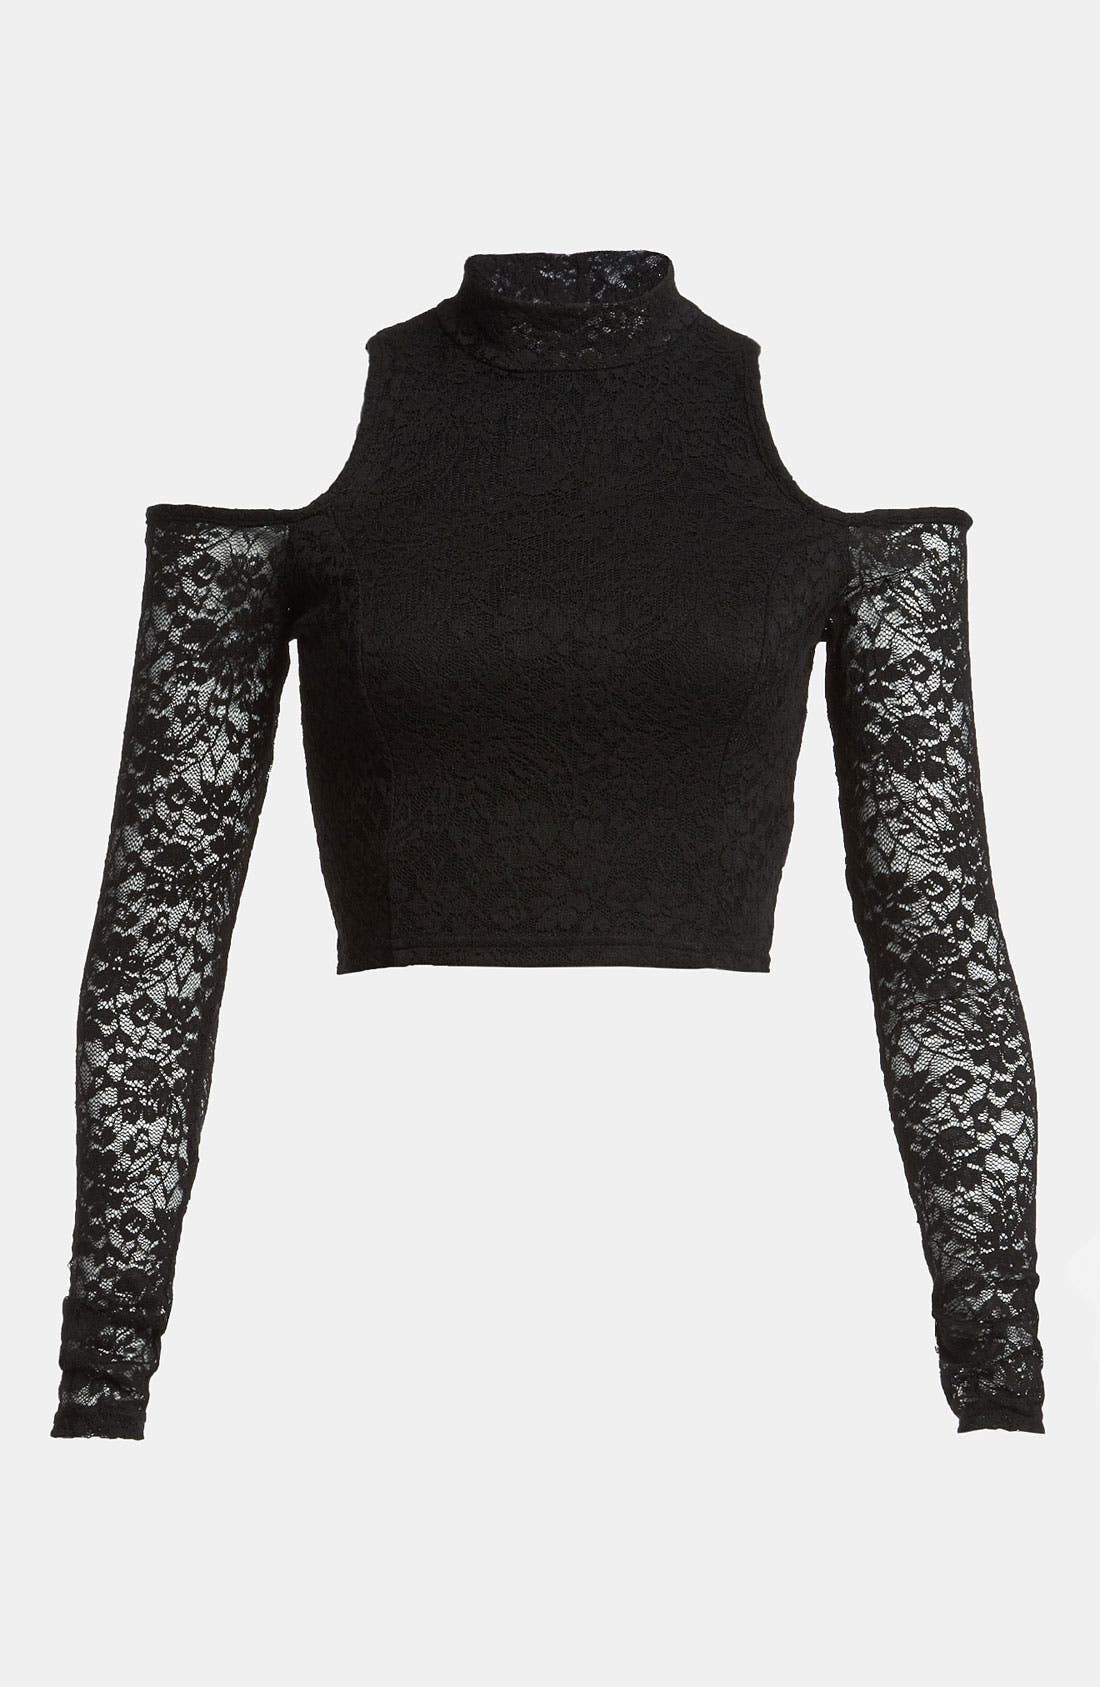 Alternate Image 1 Selected - MINKPINK 'Imogen' Stretch Lace Crop Top